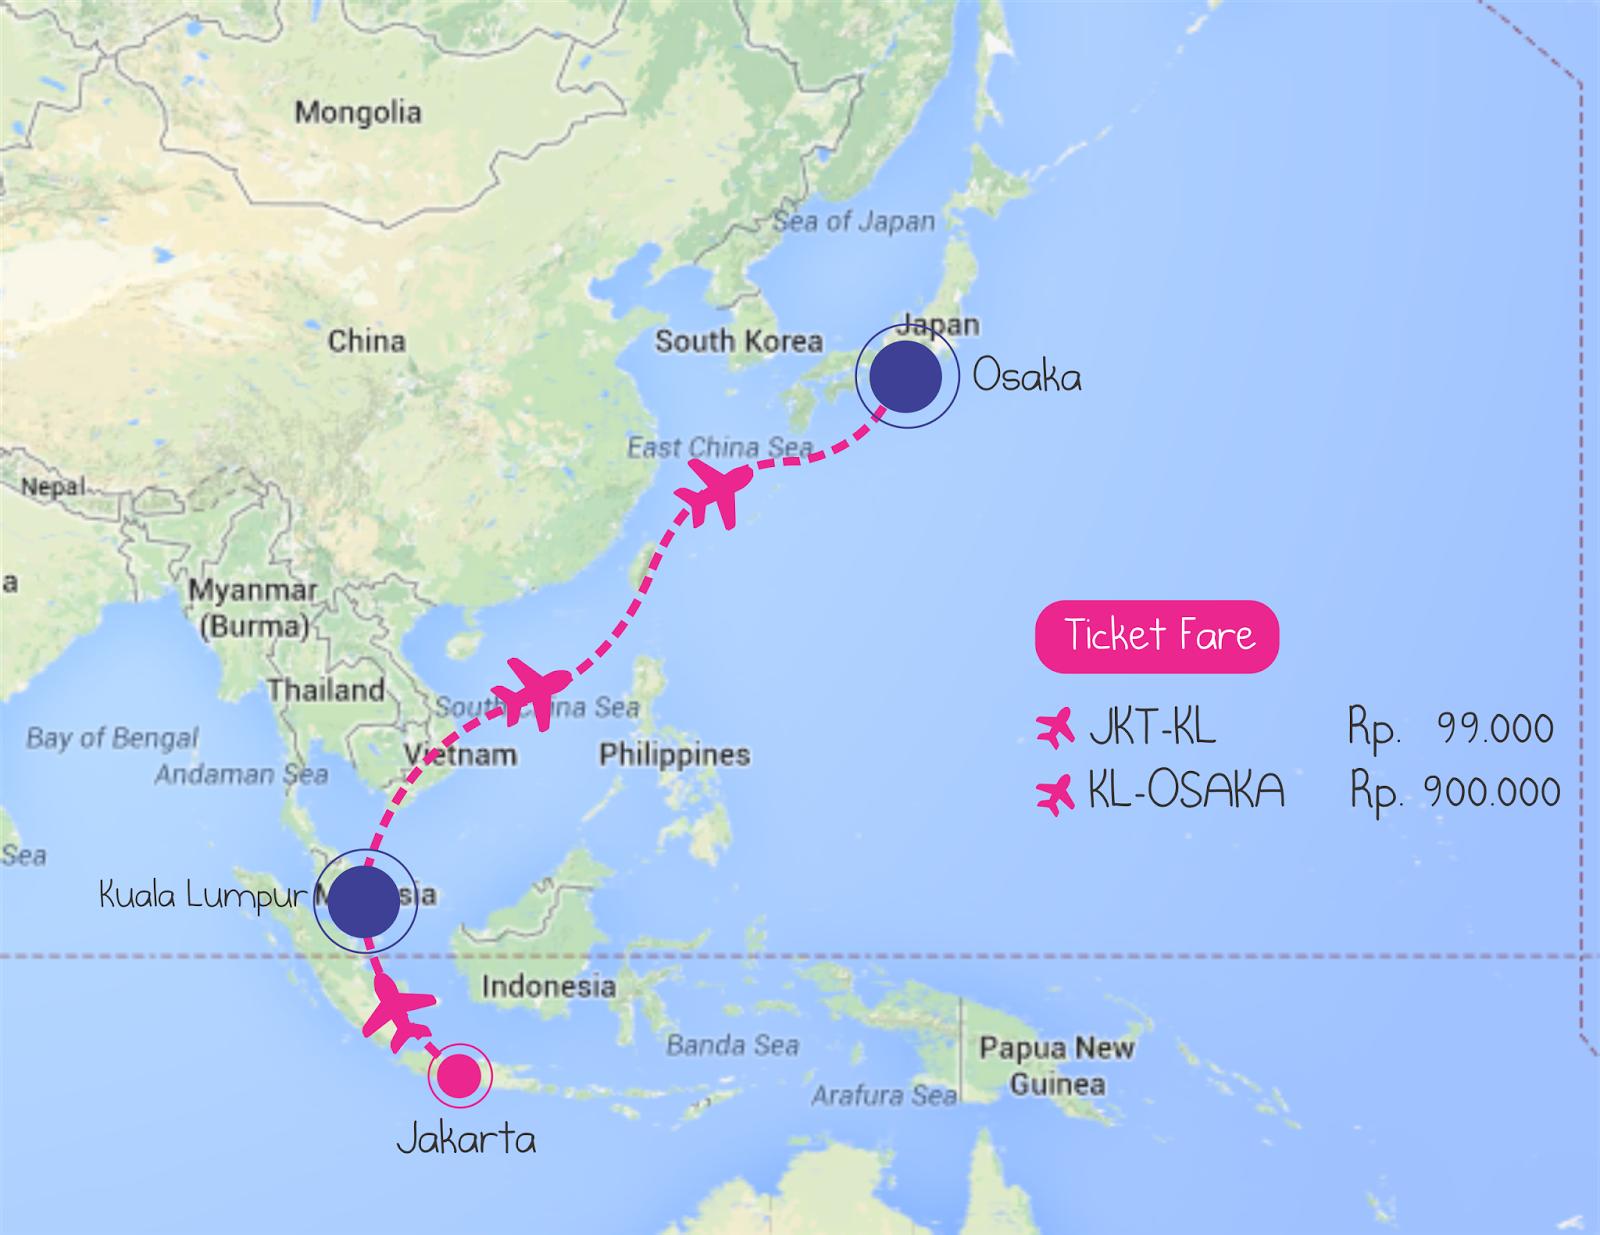 Sampai Jepang Dengan Satu Juta Rupiah Japan Part 1